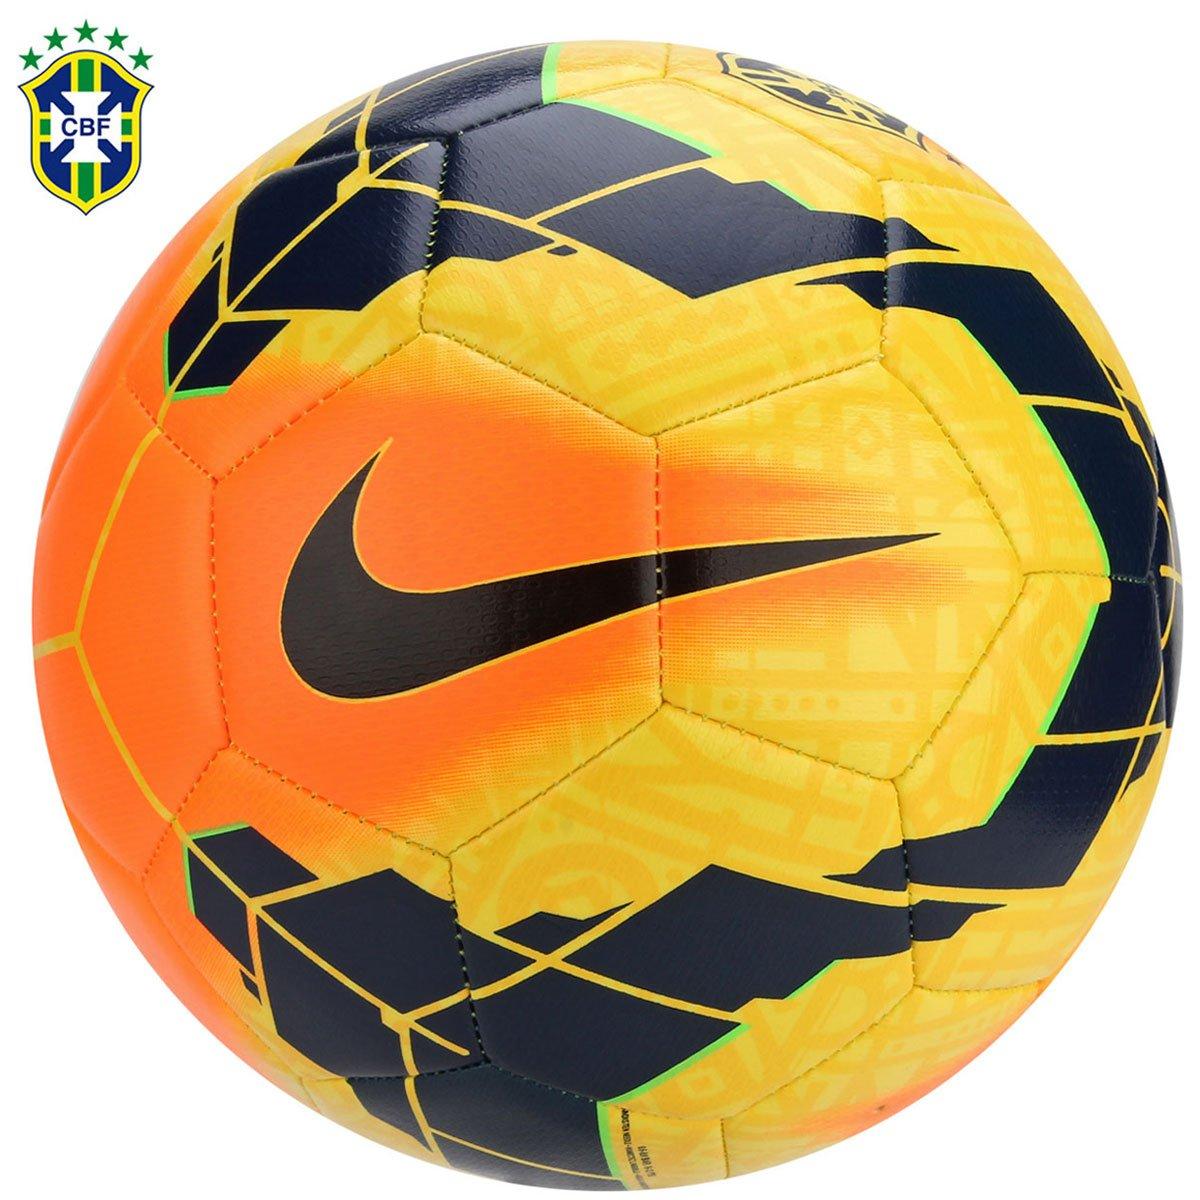 Bola Futebol Nike Strike CBF Campo - Compre Agora  ff97bfbead97b